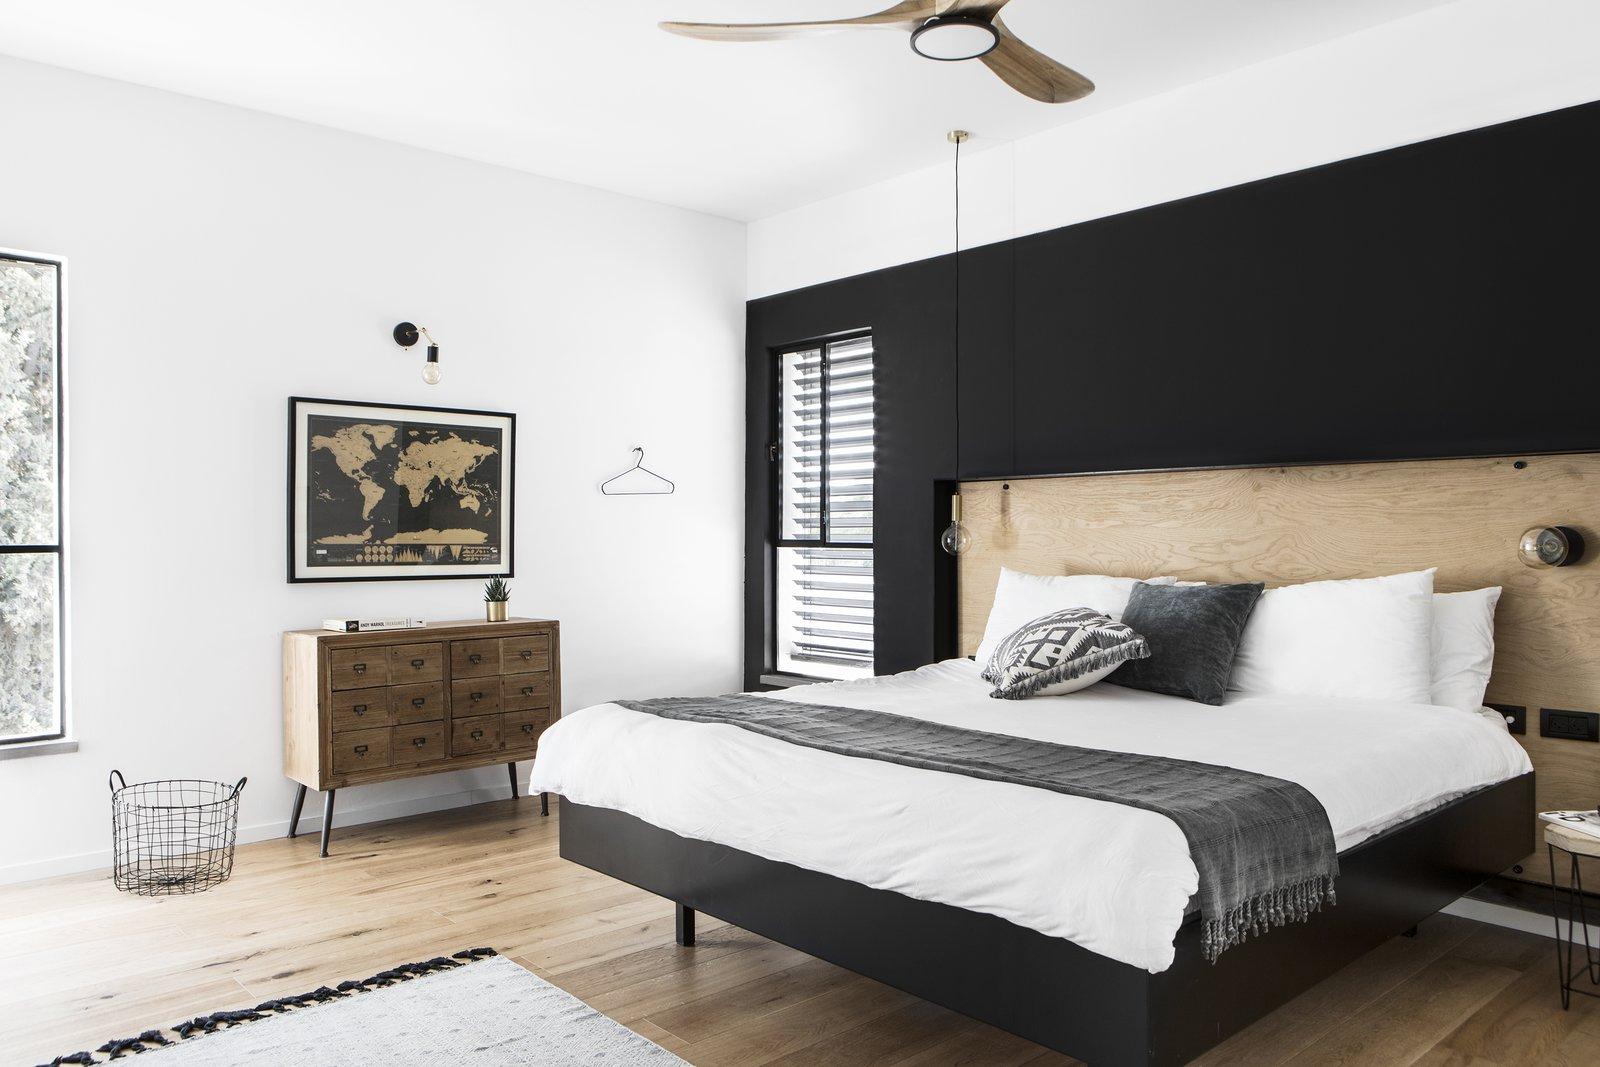 Bedroom, Bed, Dresser, Wall Lighting, Pendant Lighting, and Medium Hardwood Floor The master bedroom.  Nir Am House by Shir Shtaigman